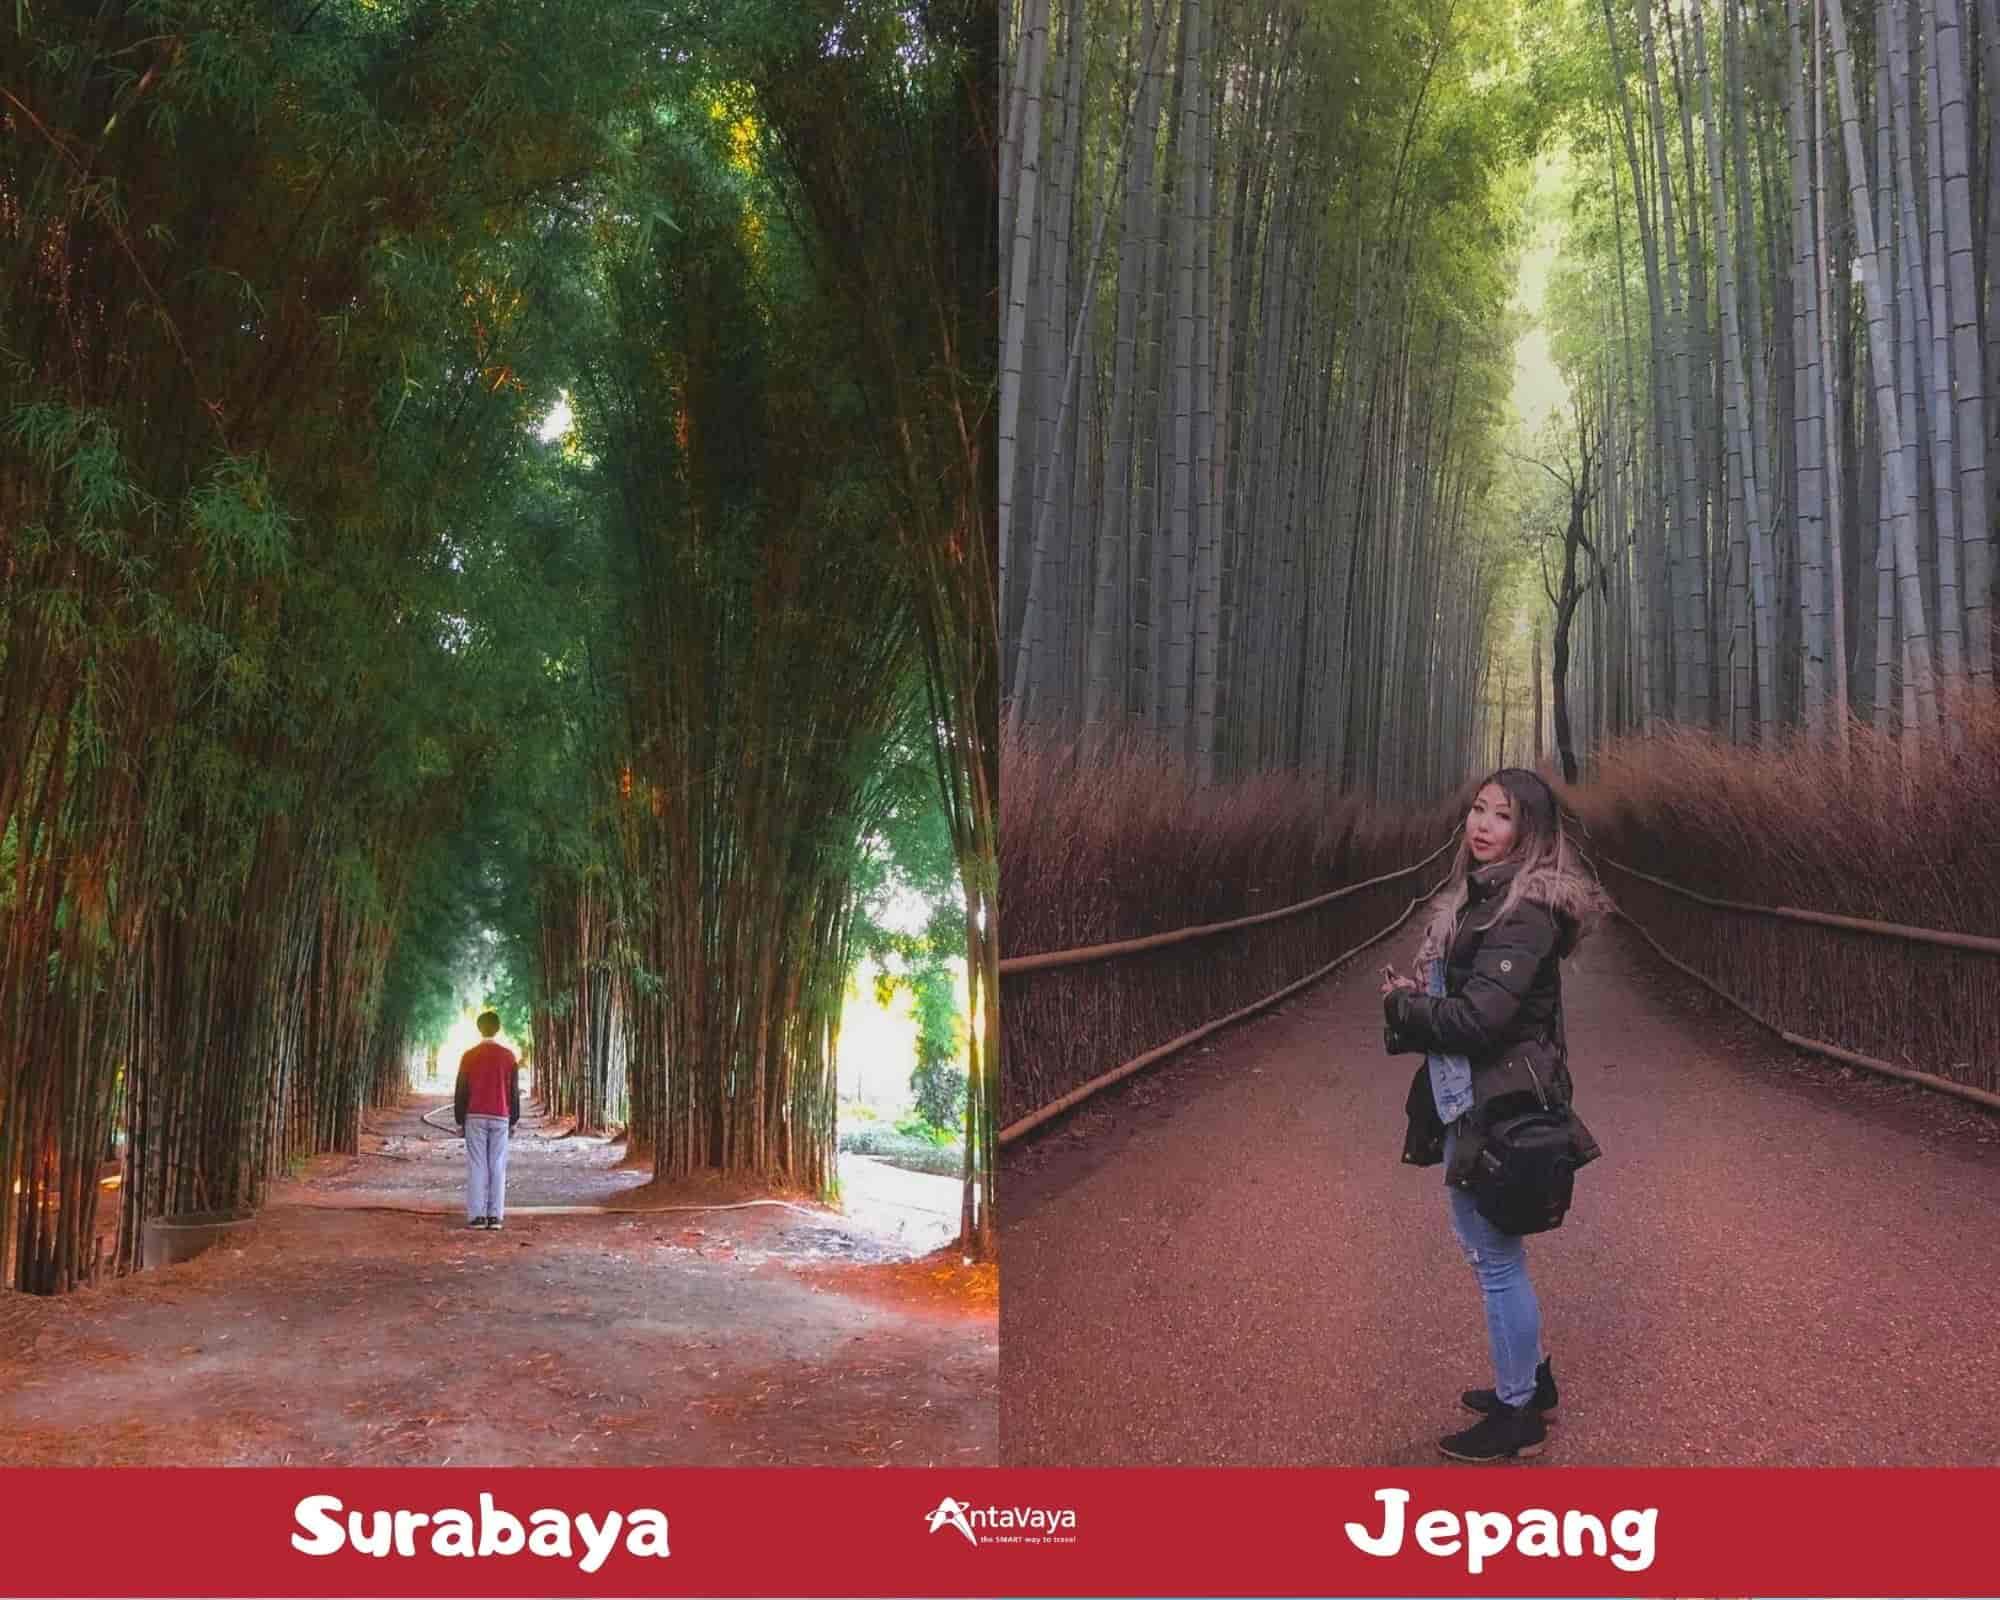 Spot Destinasi Indonesia Mirip Luar Negeri - Sumber Instagram calvin_jefferson dan savorwithmel